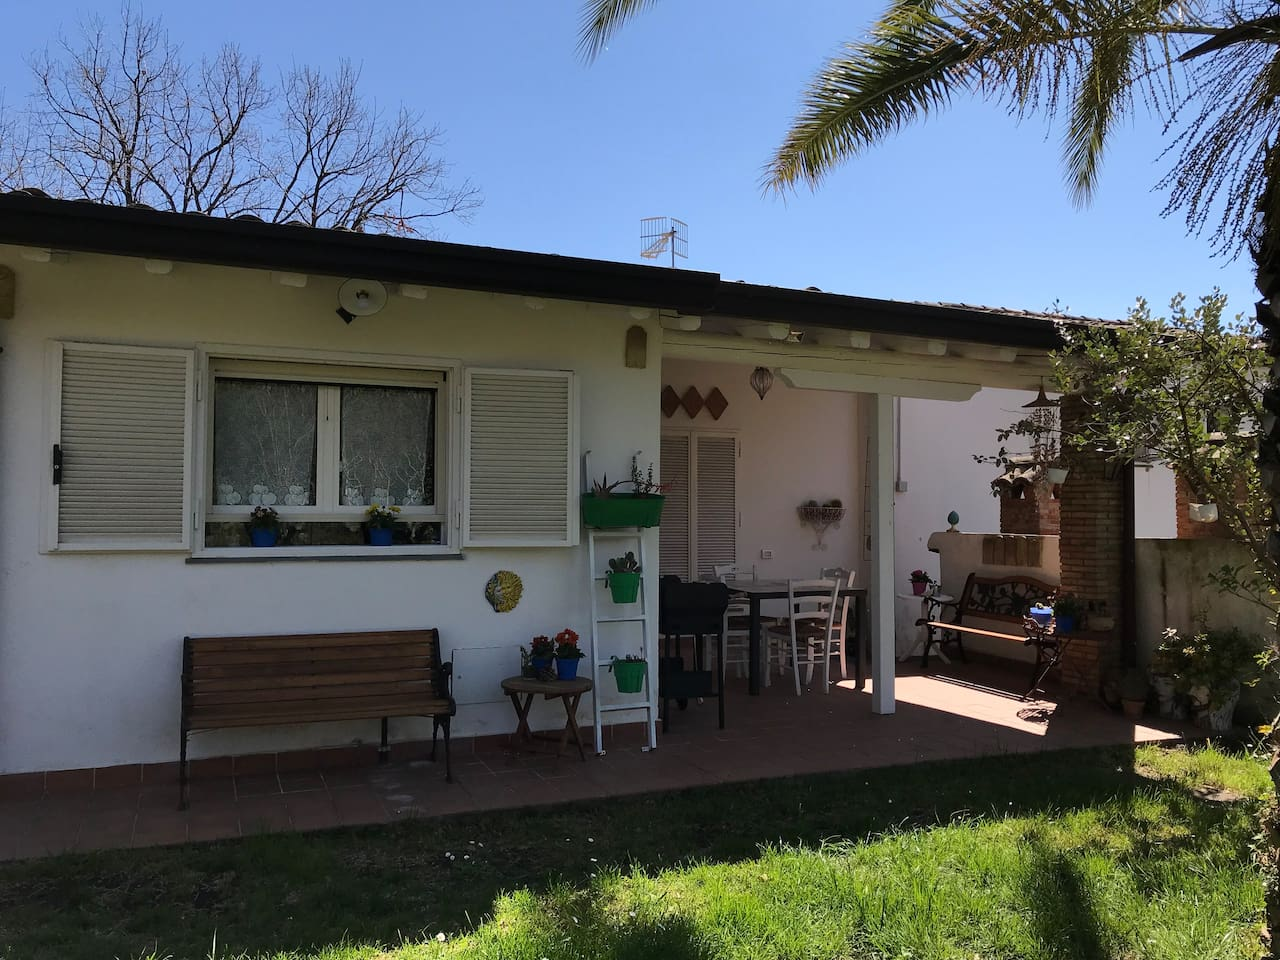 Ingresso lato giardino con patio